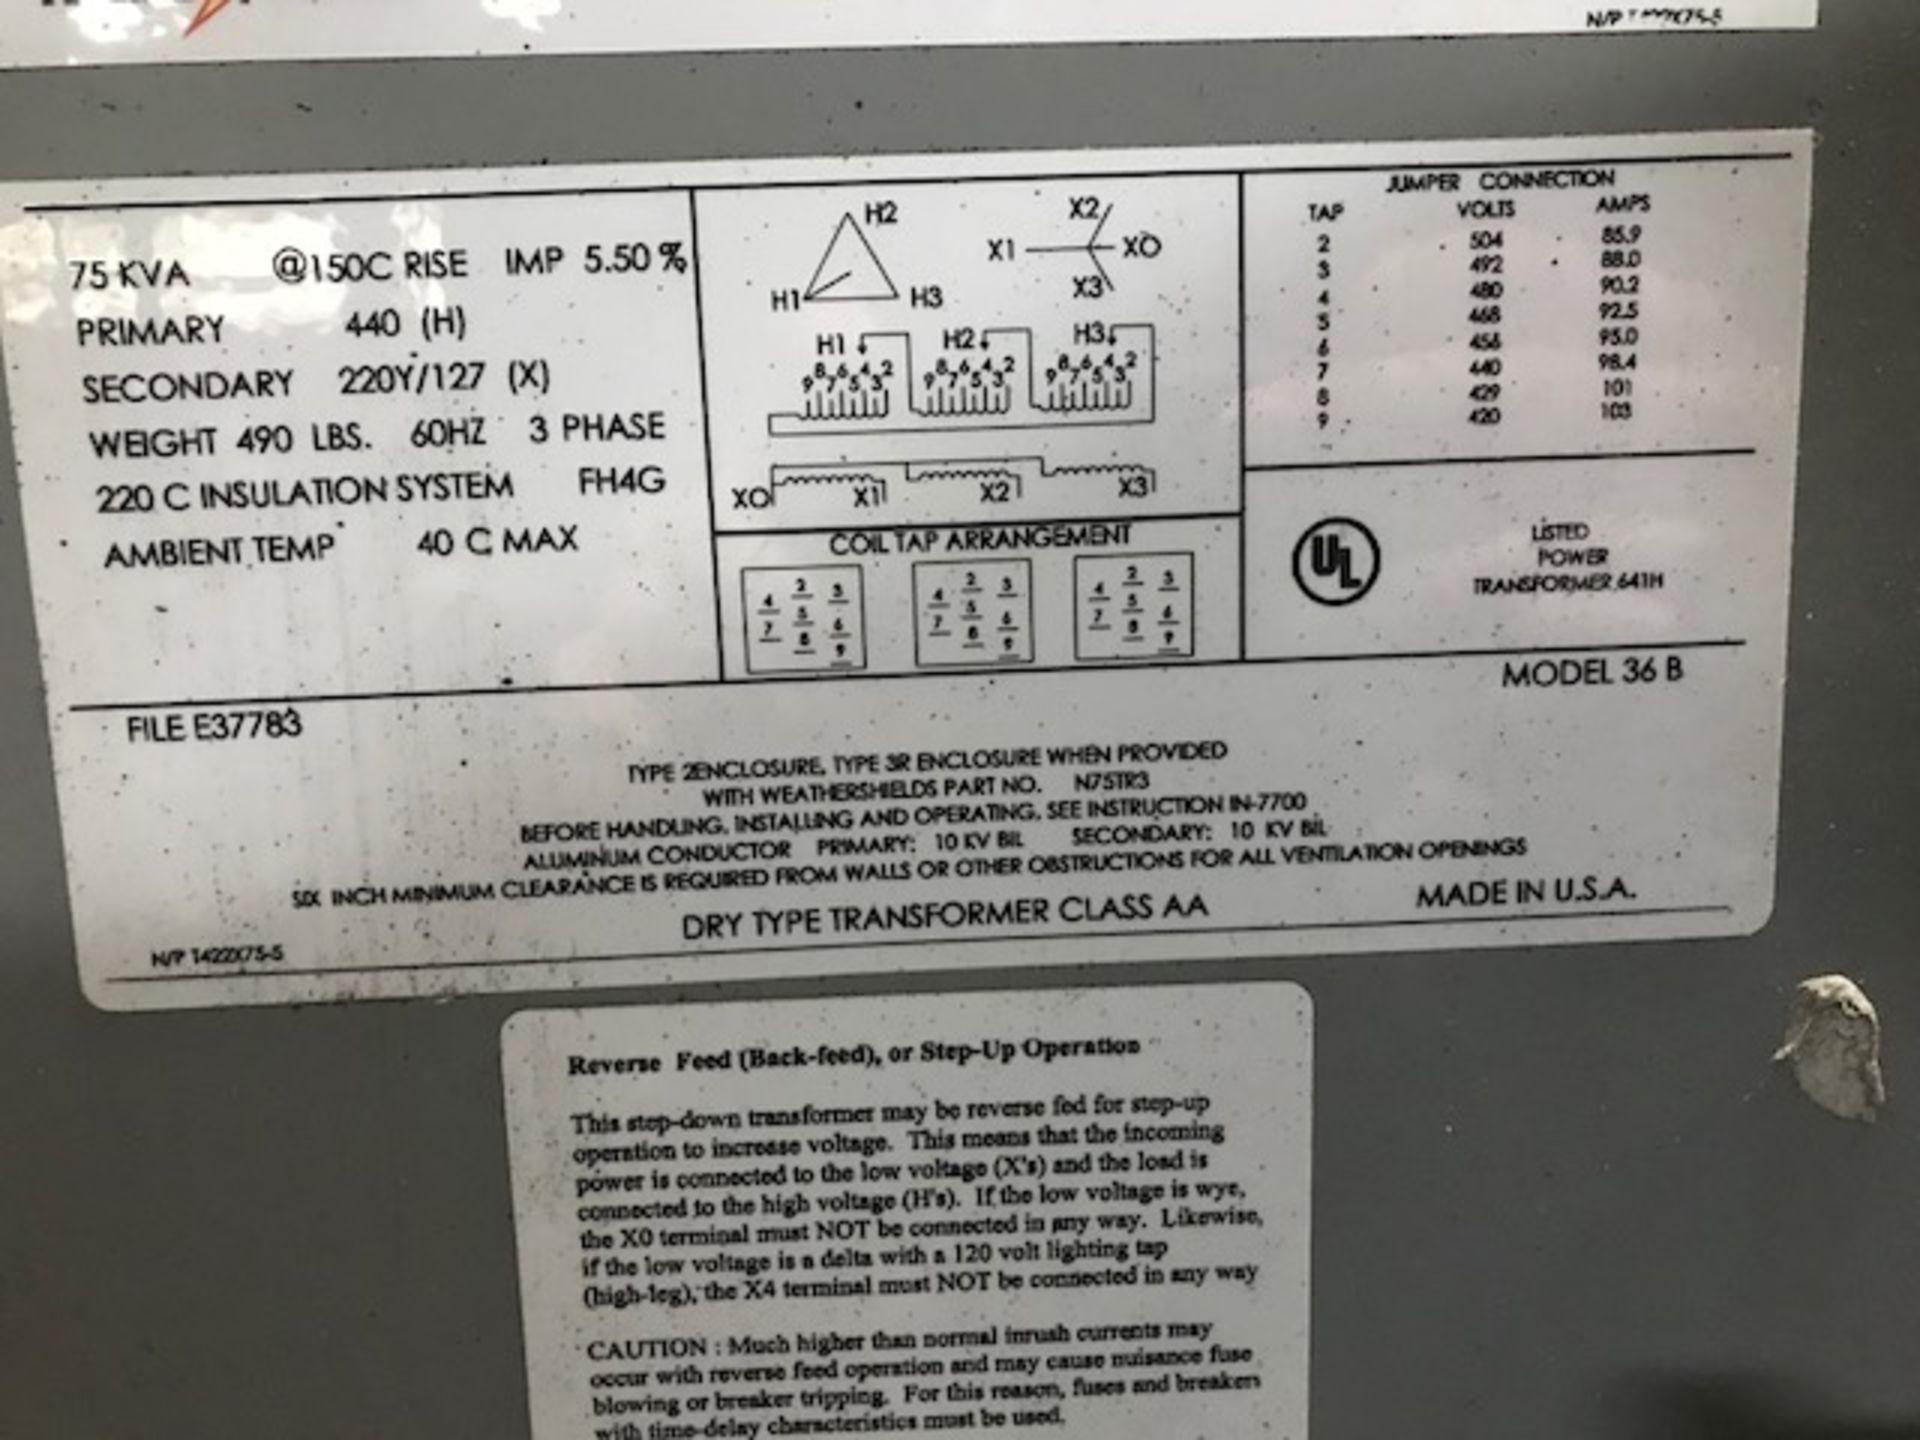 Lot 134 - Federal Pacific Transformer, 75 KVA (LOCATION: 3421 N SYLVANIA, FT WORTH, TX, 76111)